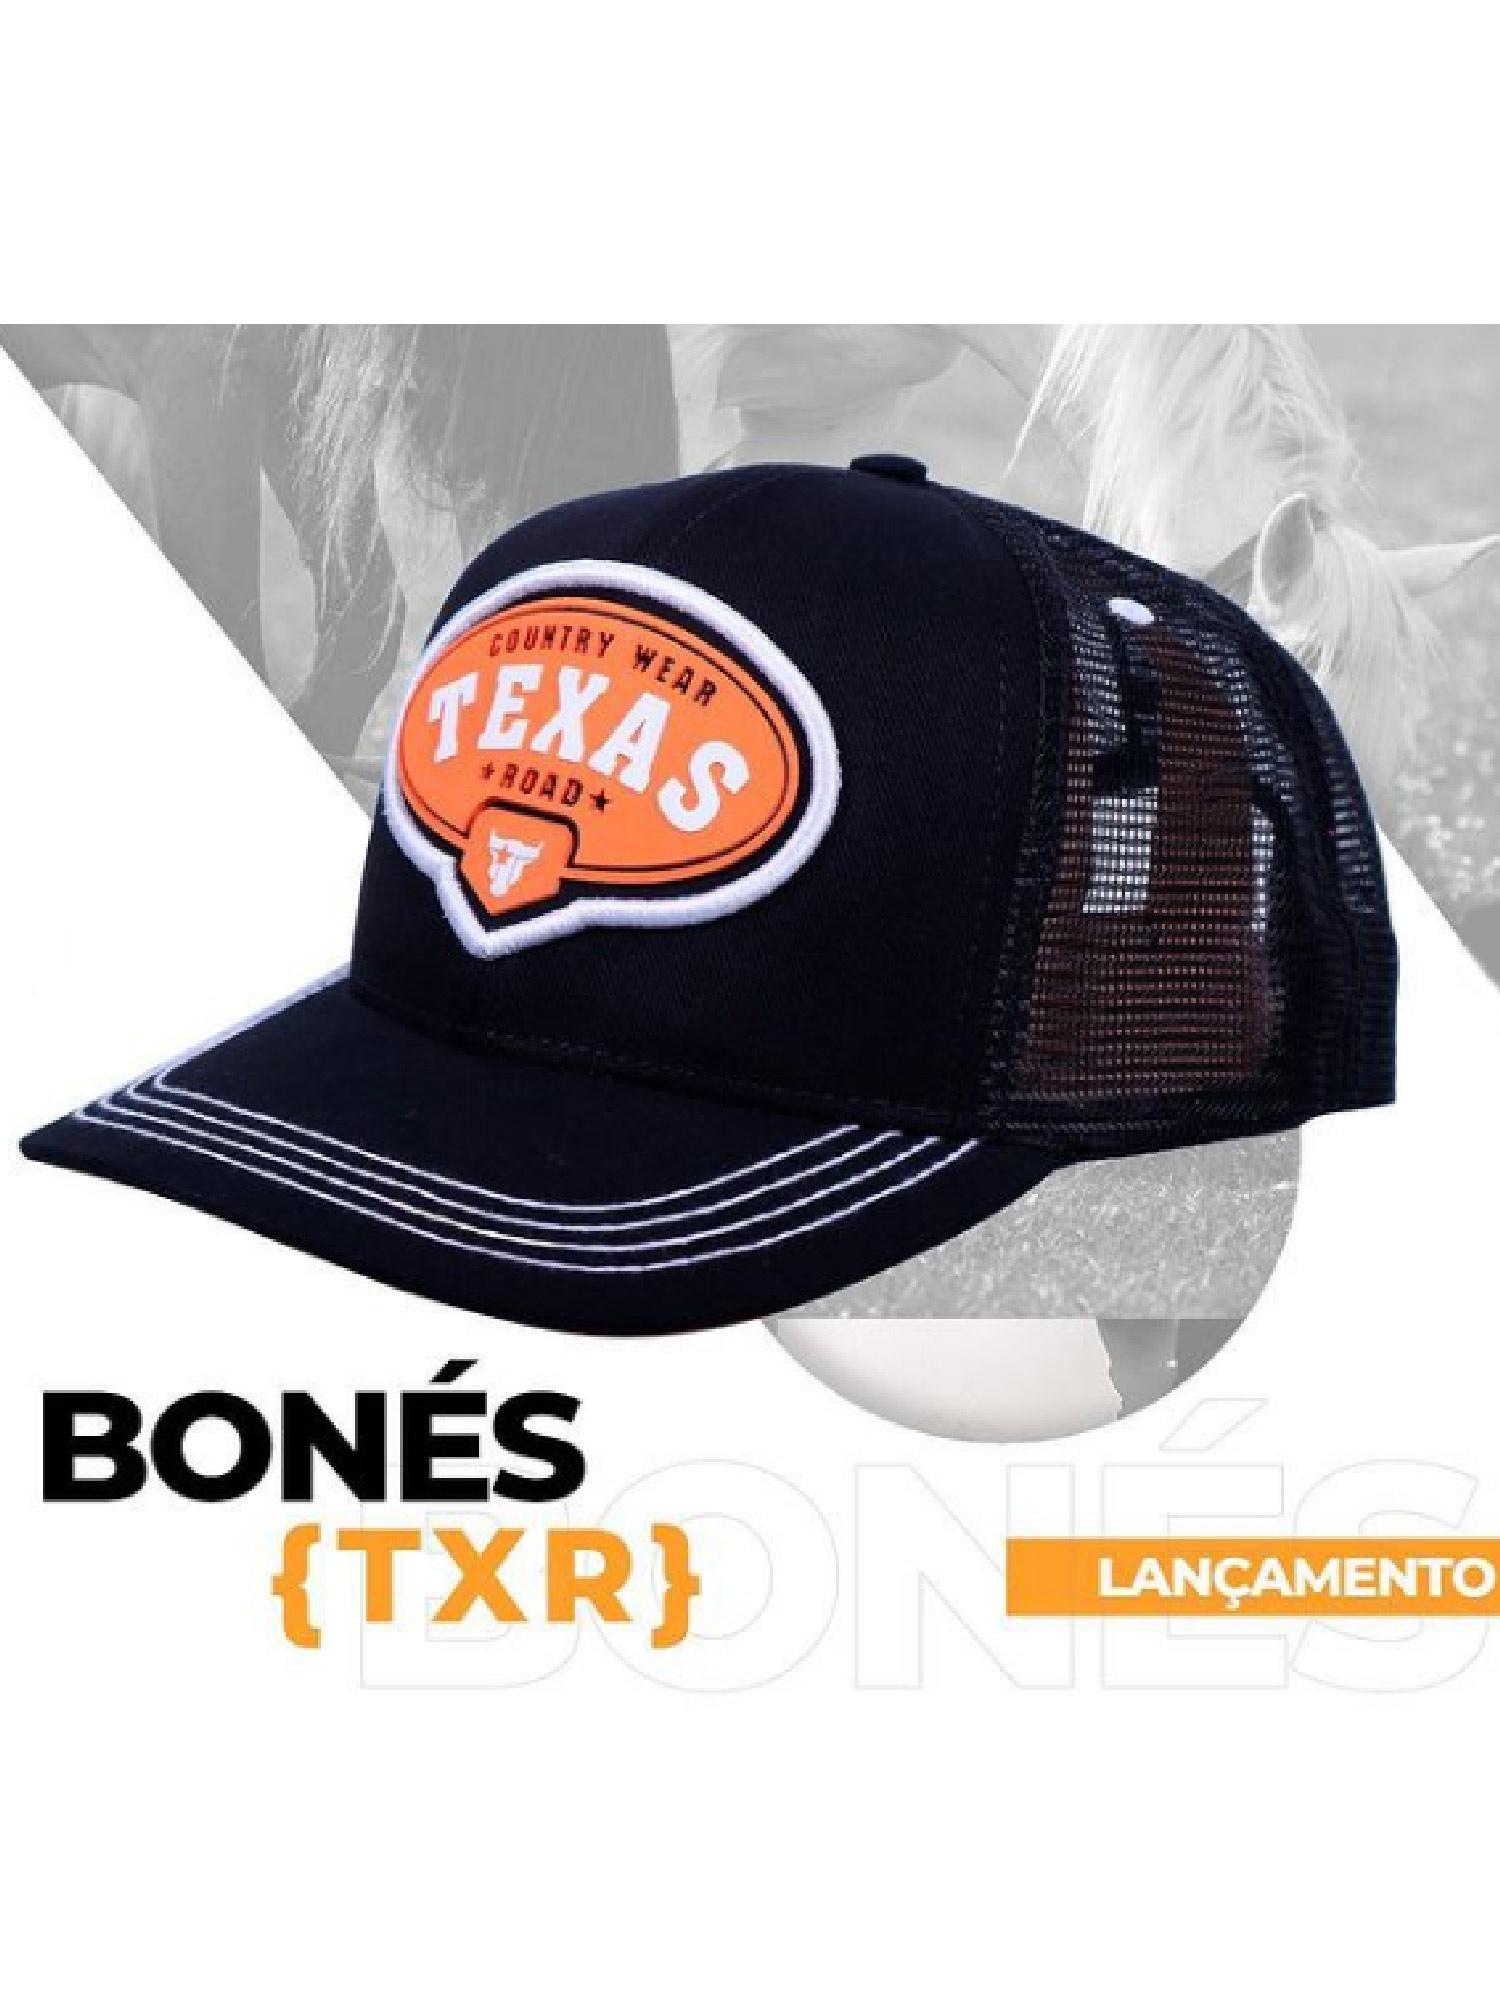 Boné Texas Road Preto e Laranja Country Wear